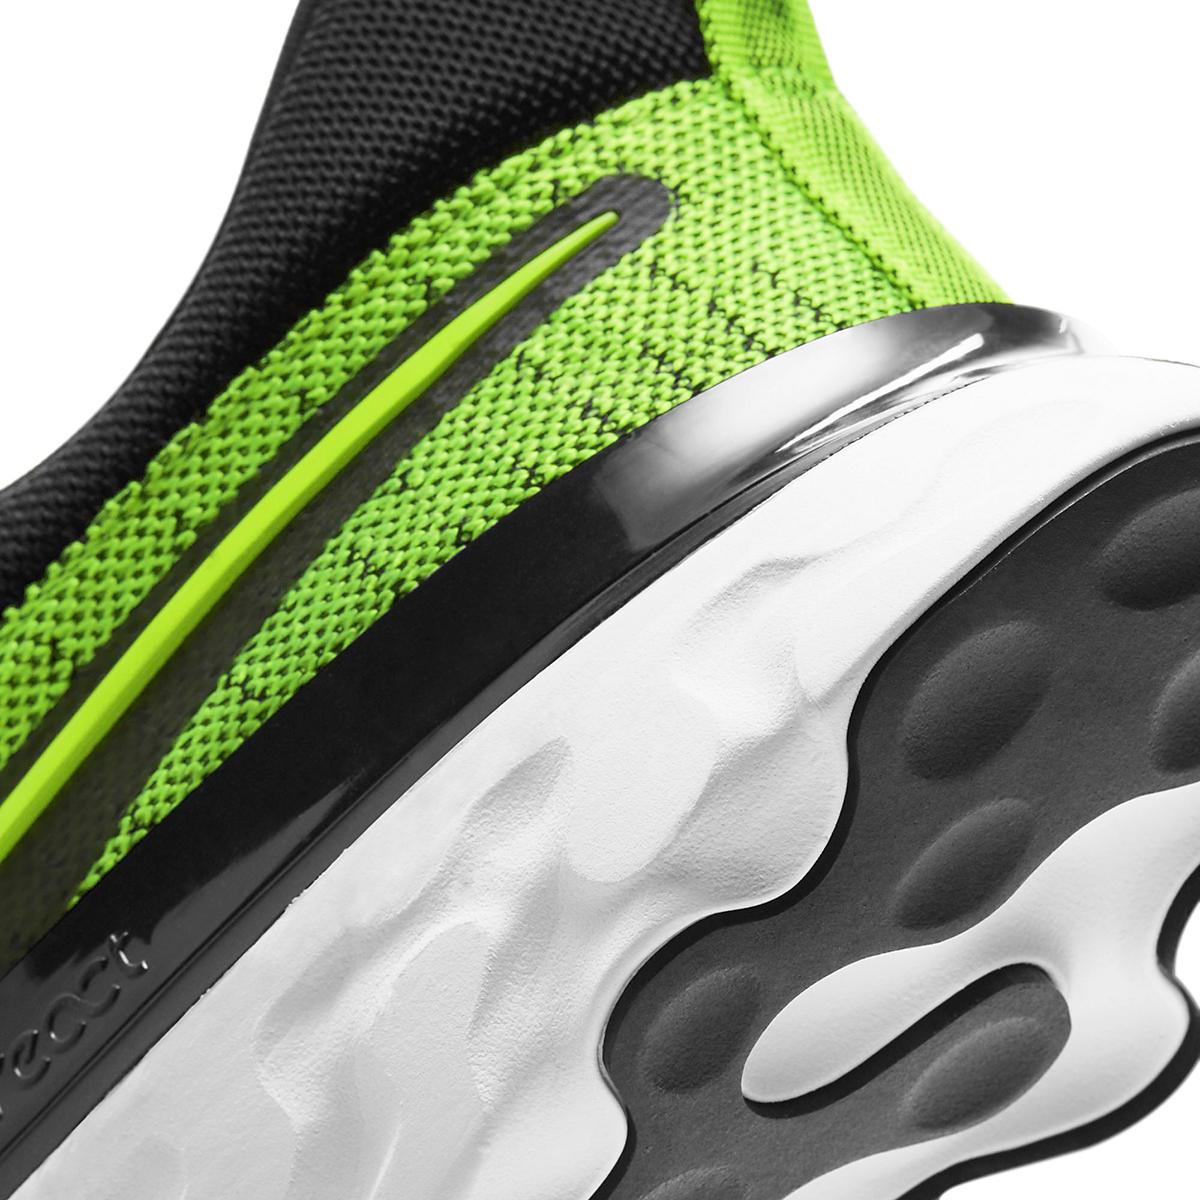 Men's Nike React Infinity Run Flyknit 2 Running Shoe - Color: Volt/Black - Size: 6 - Width: Regular, Volt/Black, large, image 5